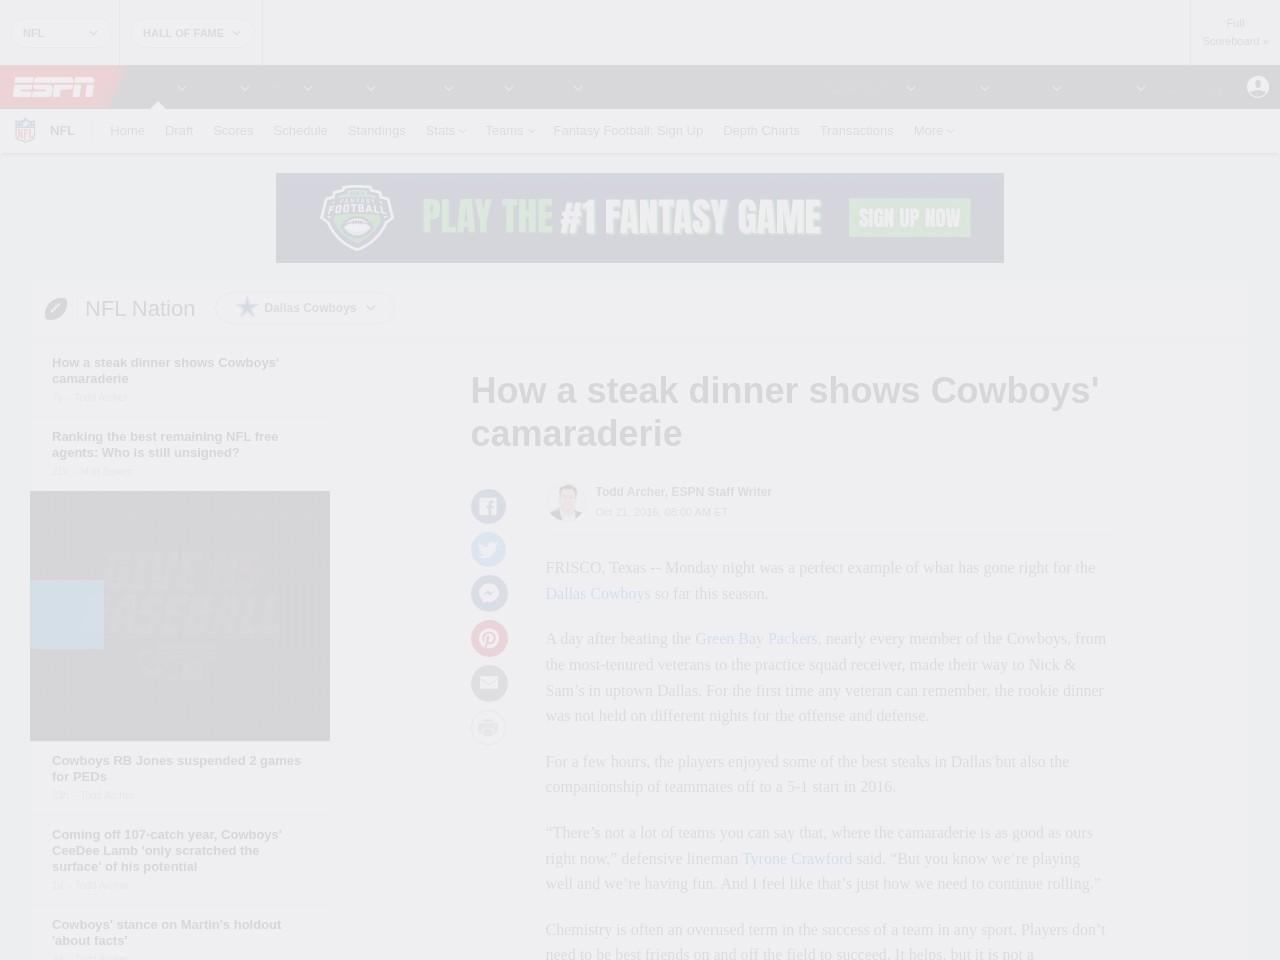 How a steak dinner shows Cowboys' camaraderie